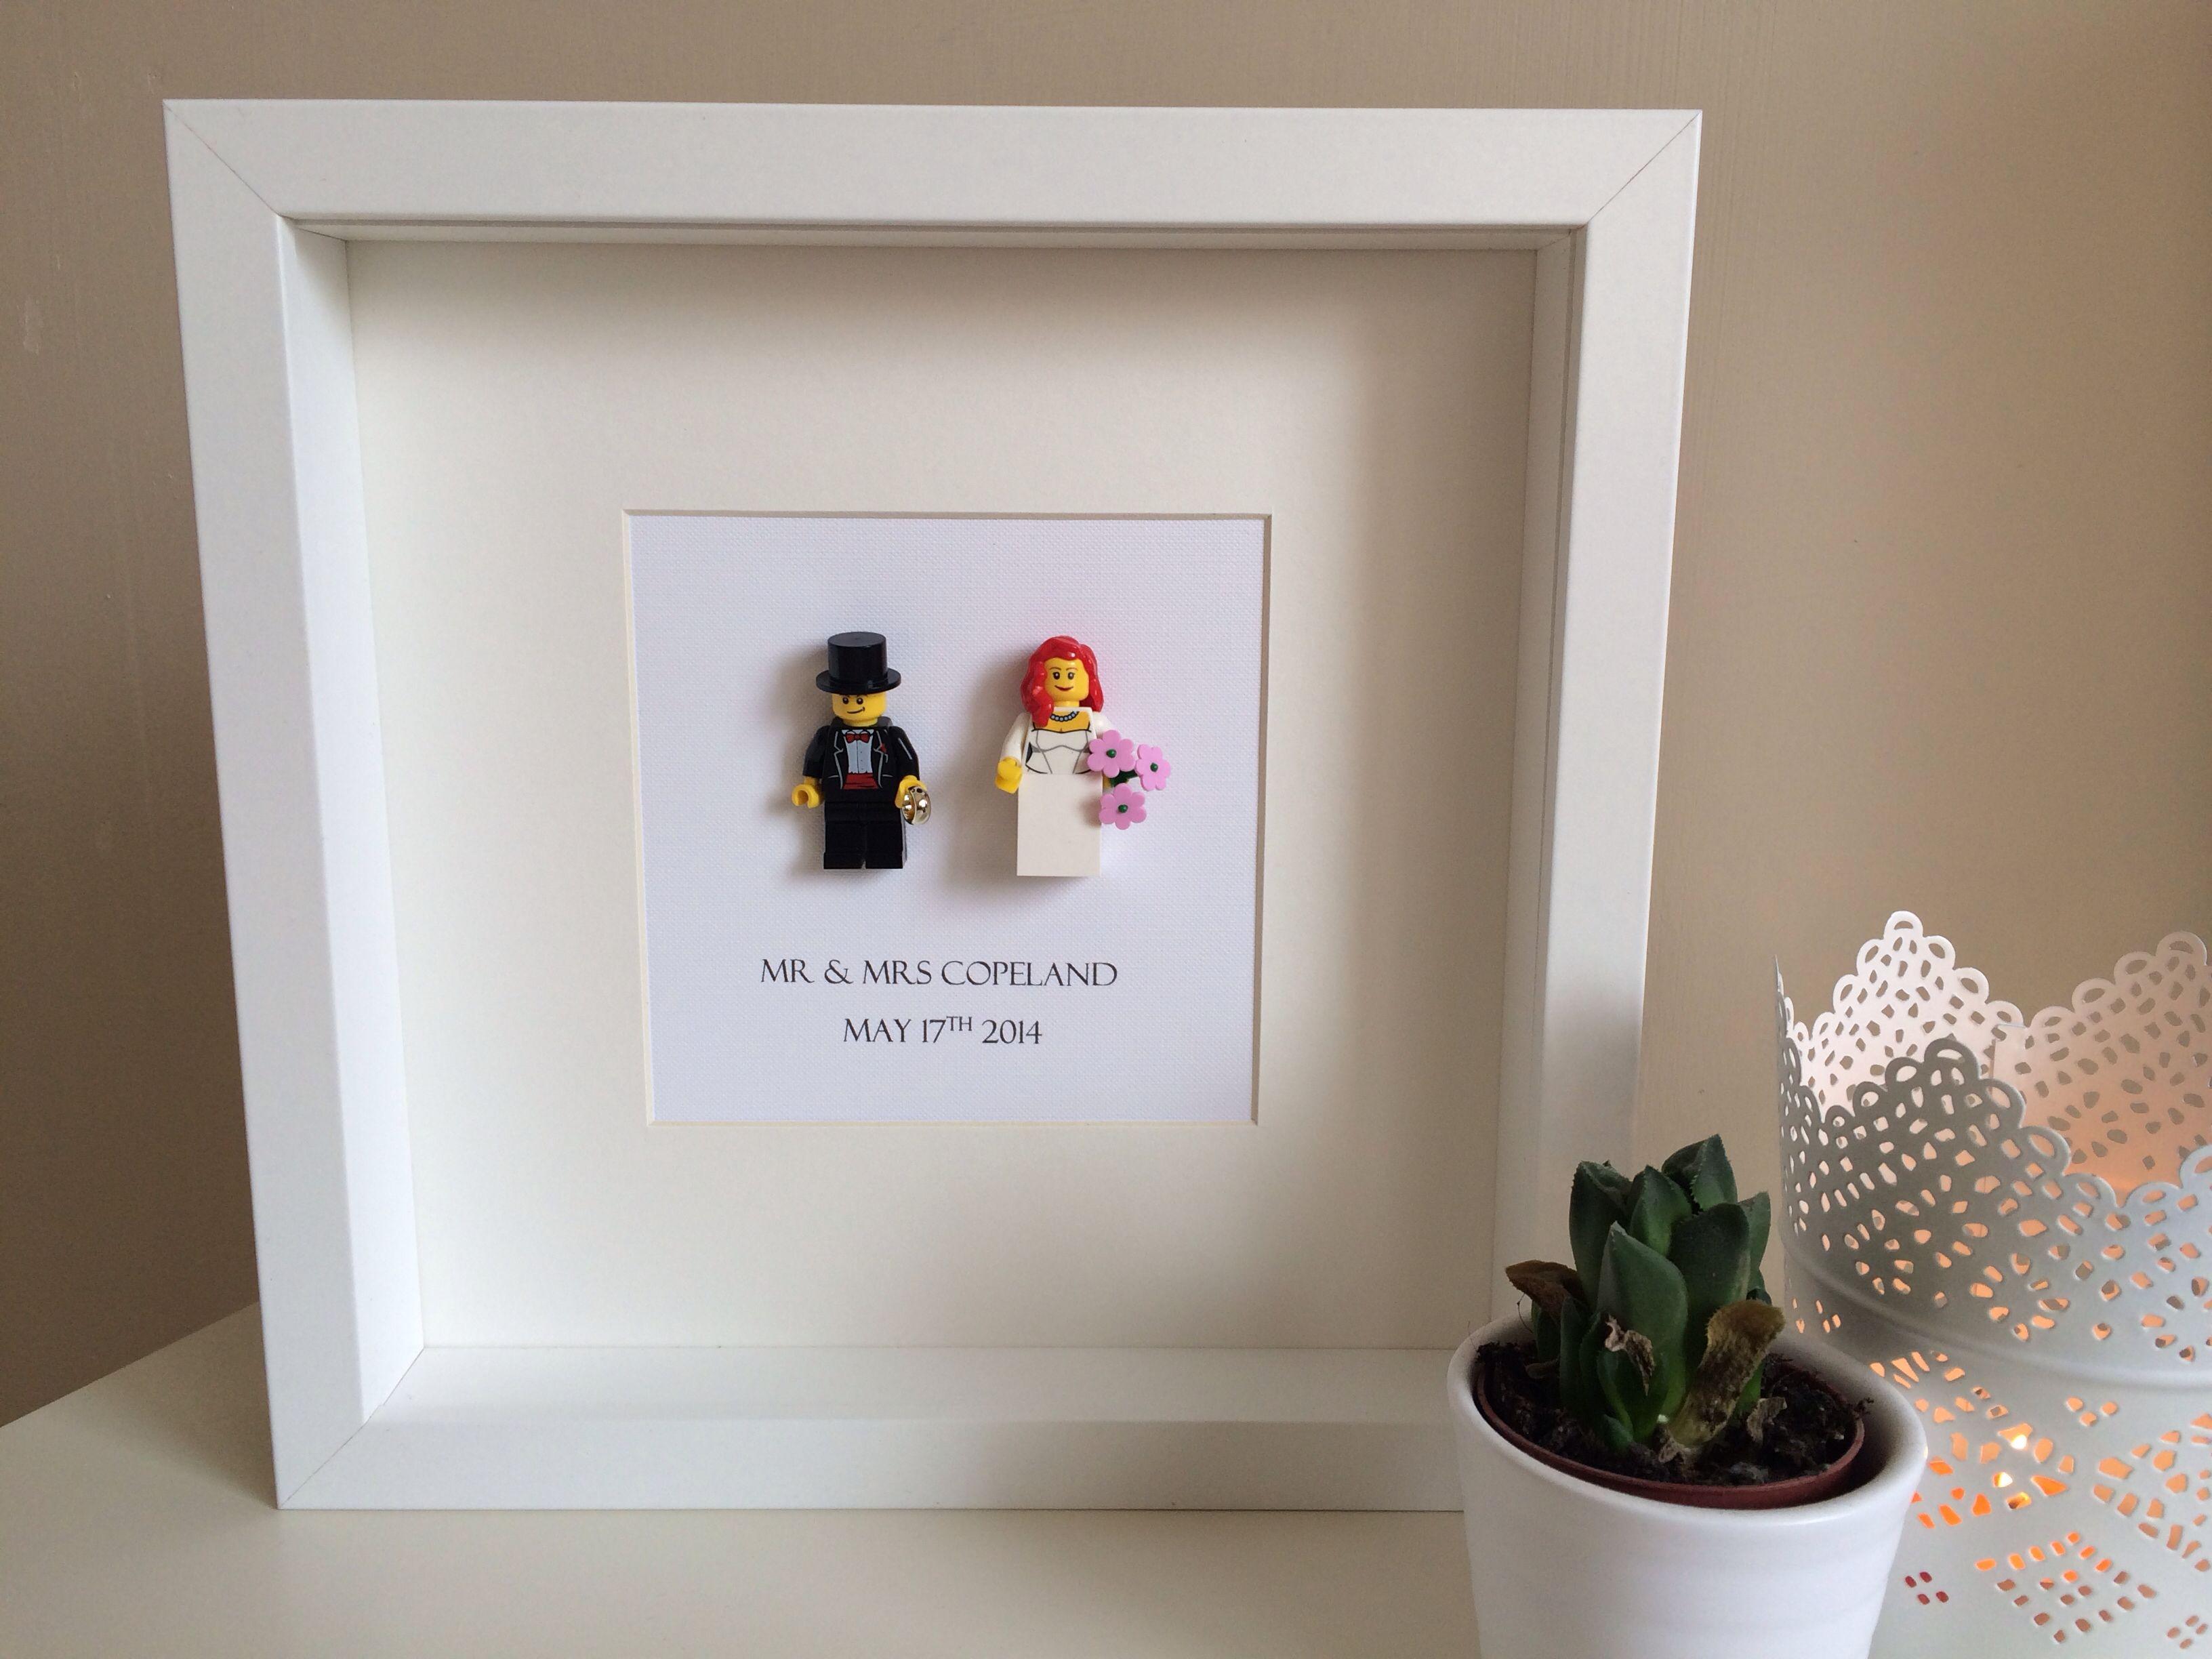 lego wedding mr mrs frame bride groom wedding marriage love - Mr And Mrs Photo Frame